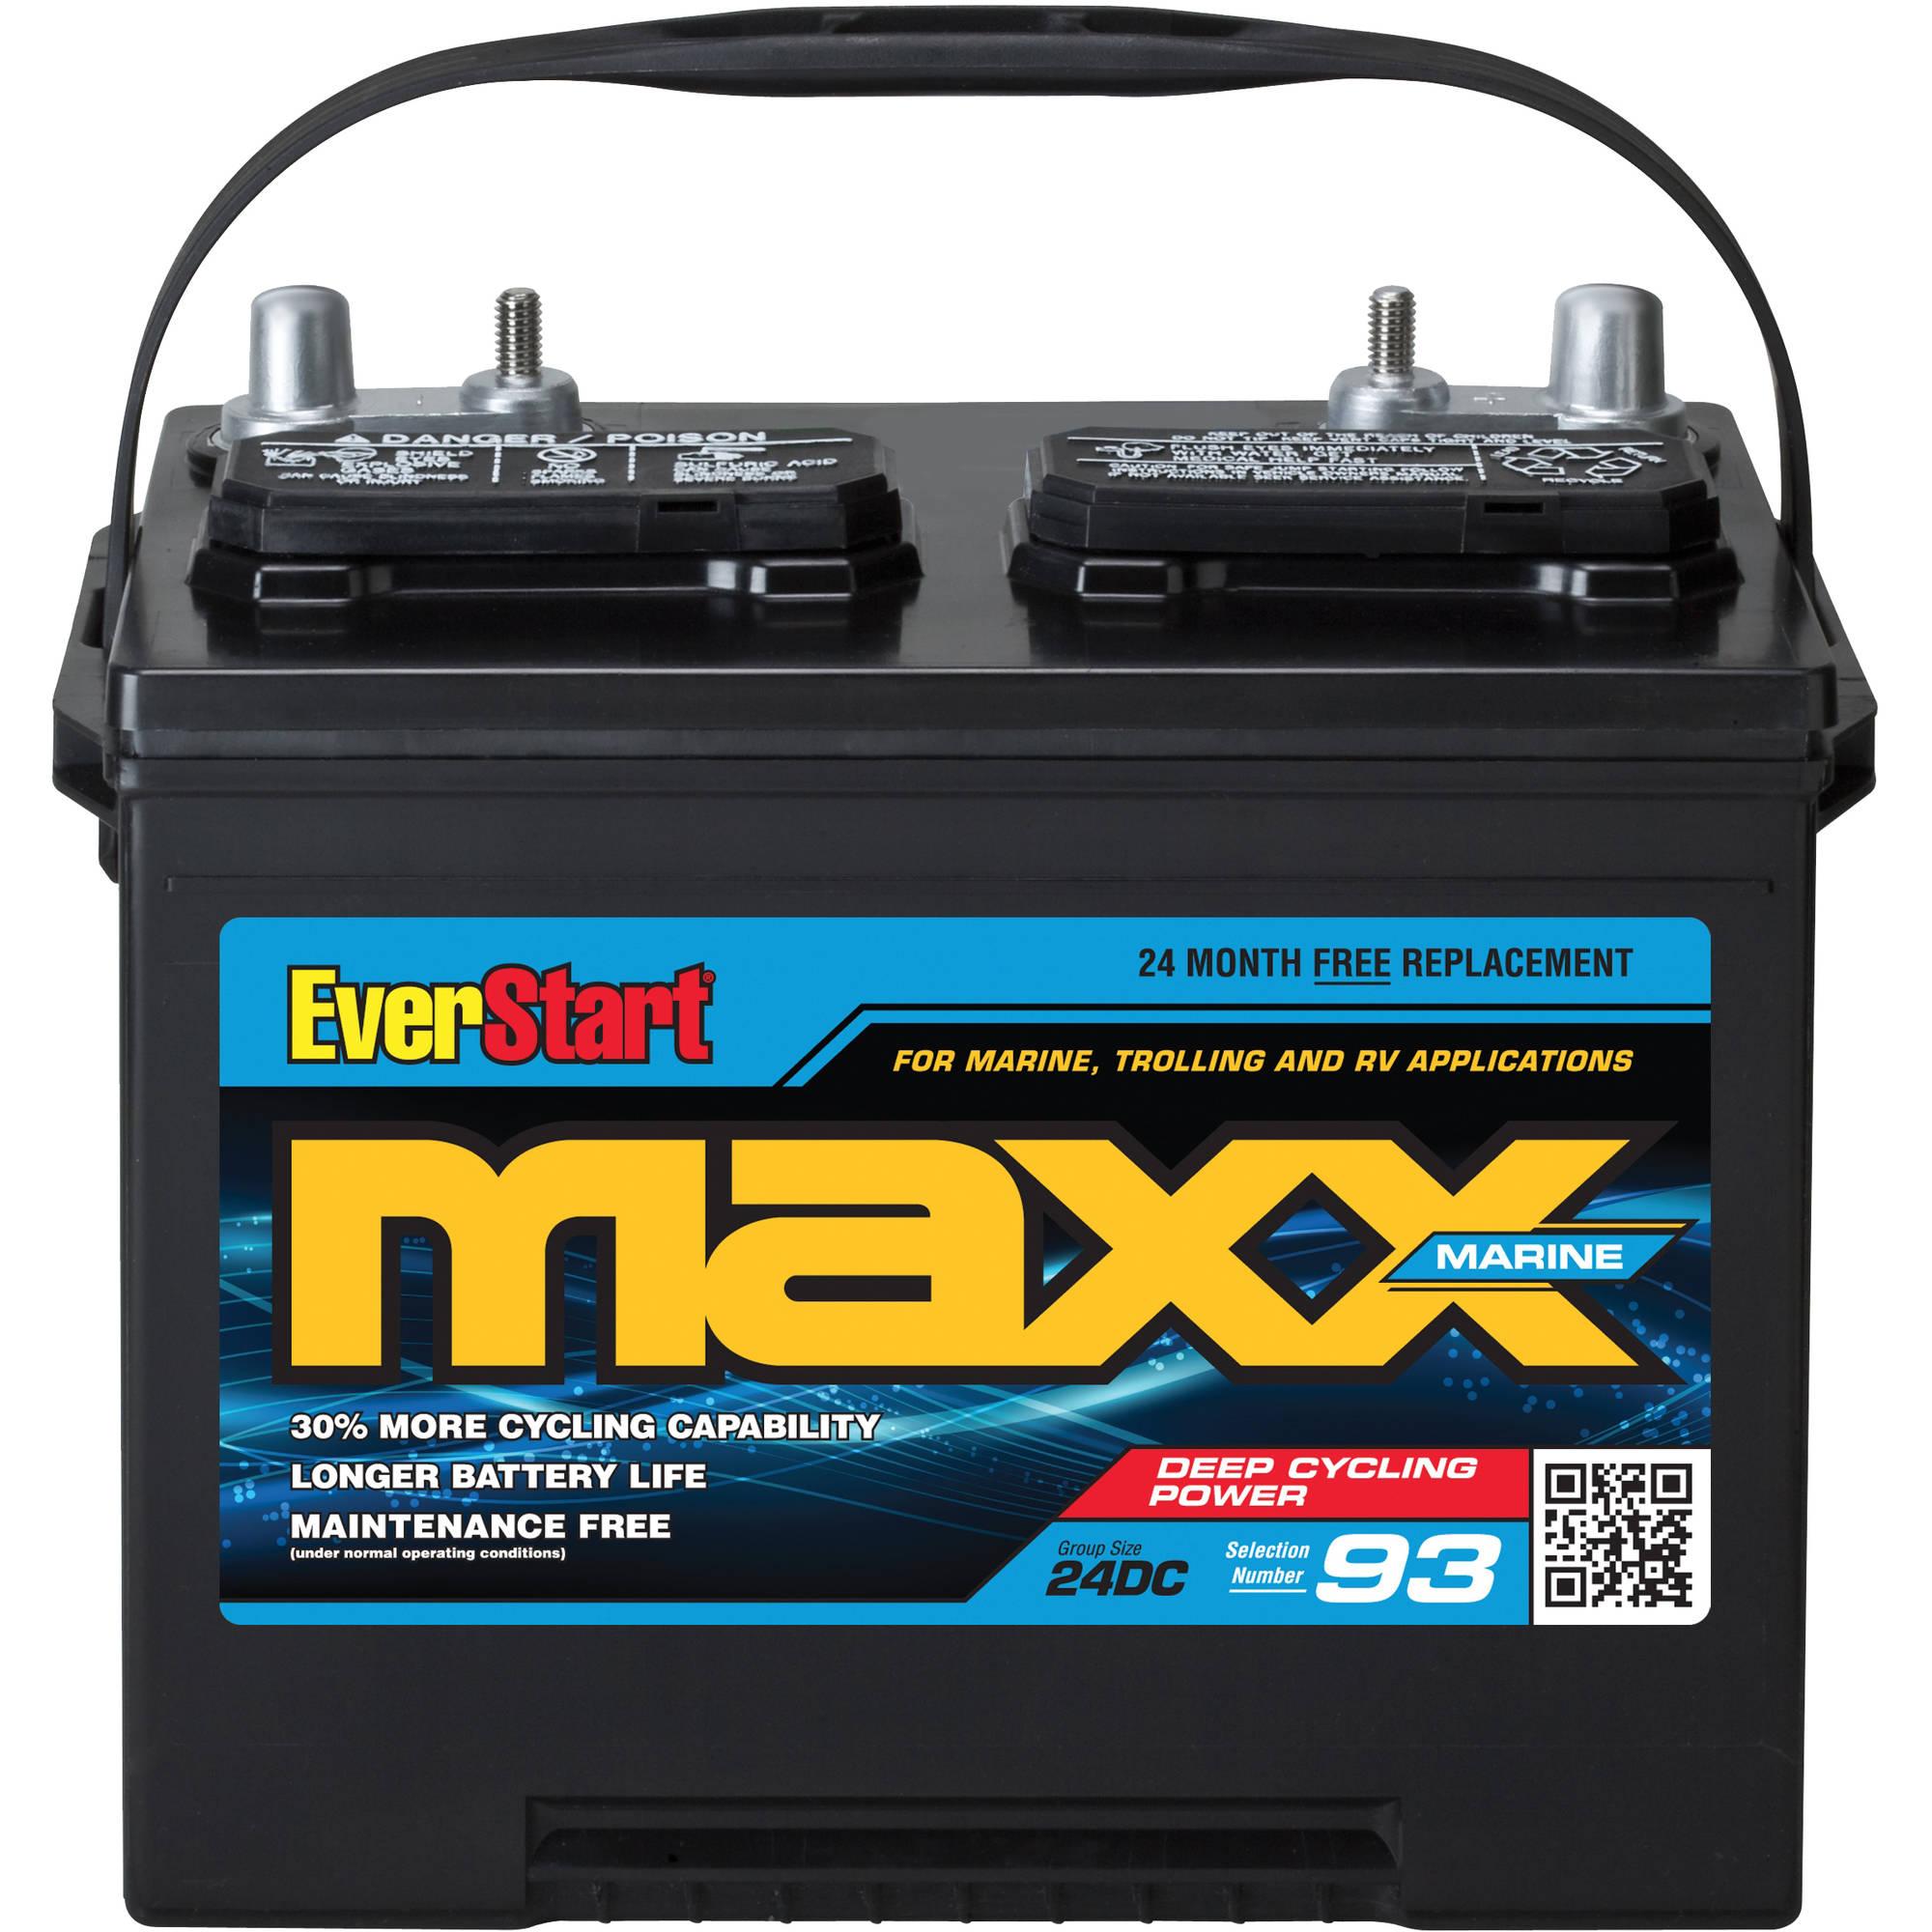 EverStart Maxx Lead Acid Marine Battery, Group 24DC ...